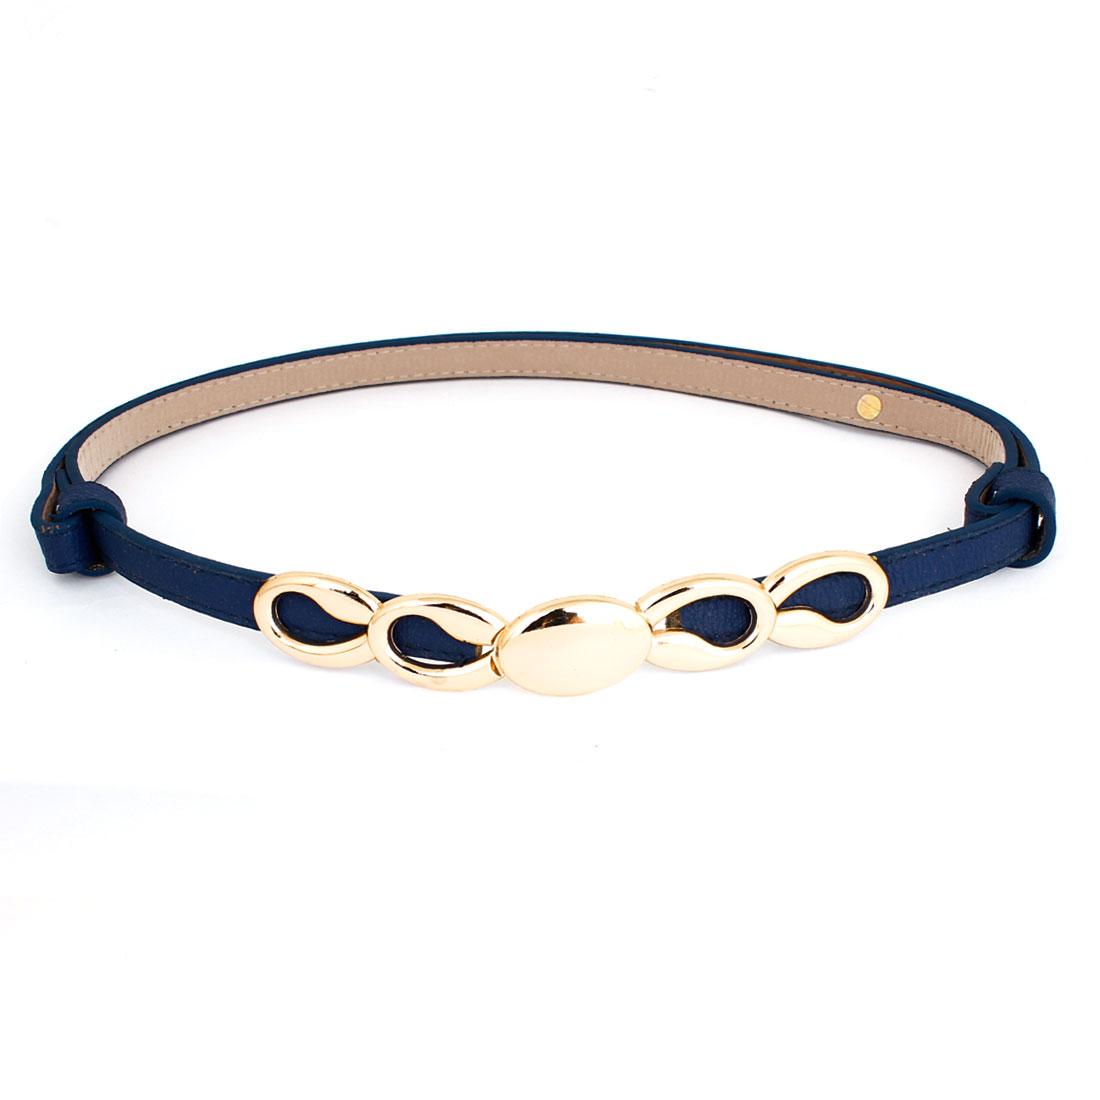 Lady Gold Tone Interlocking Buckle Faux Leather Adjustable Waist Belt Dark Blue